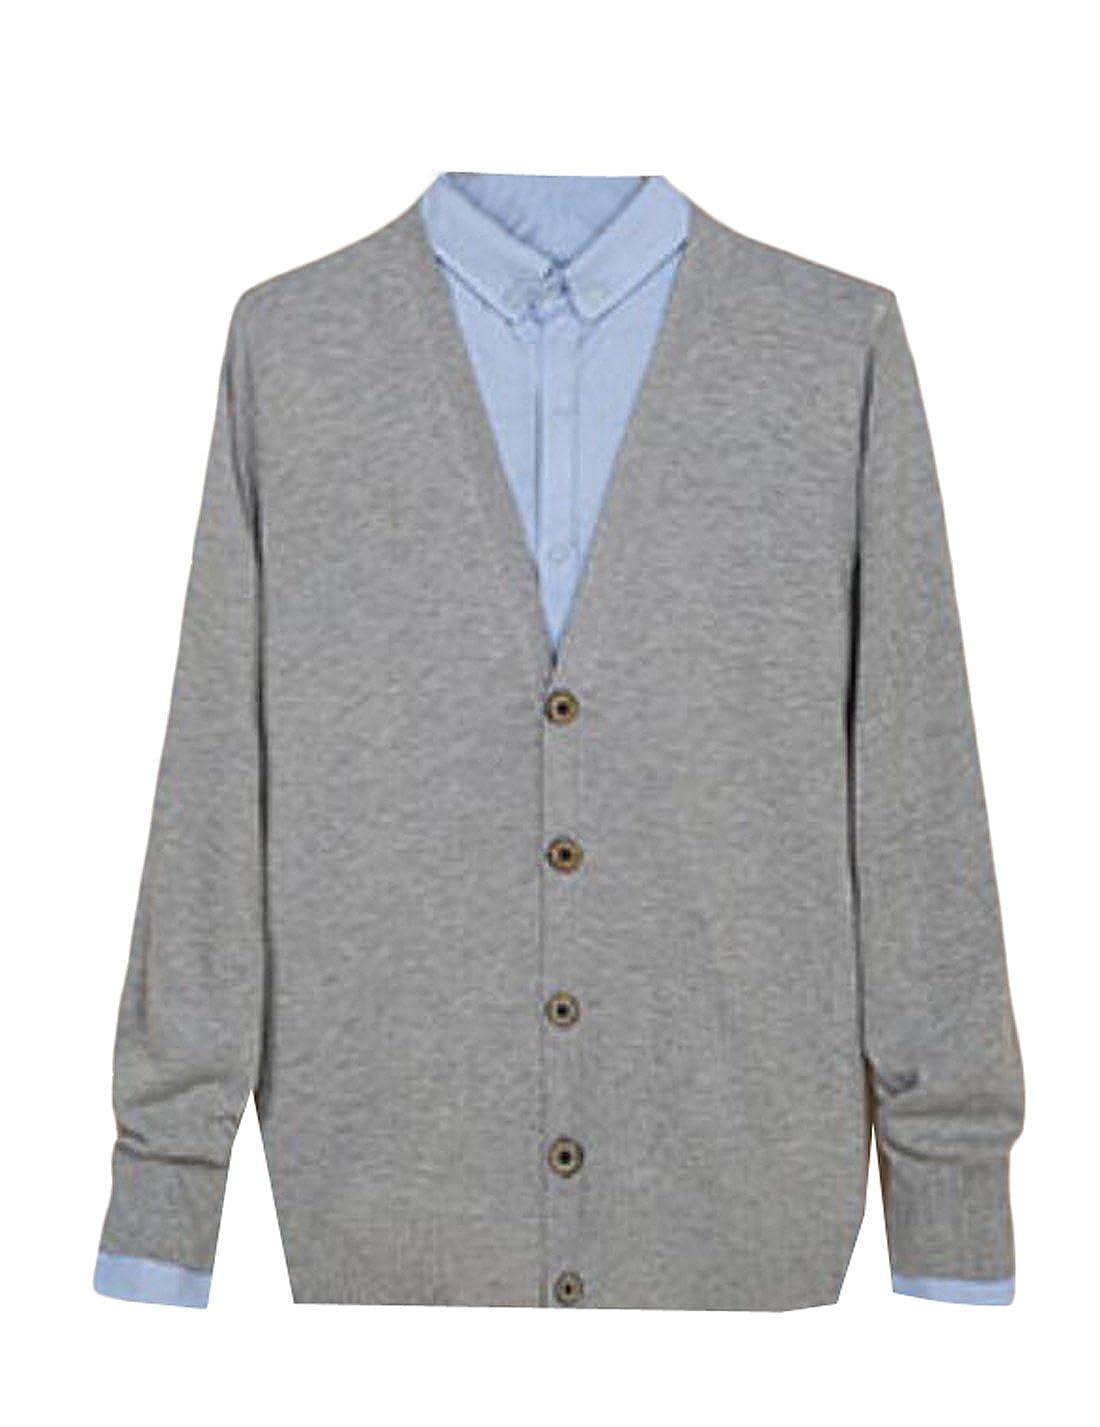 MLG Men Long Sleeve Casual Button Down V-Neck Cardigan Sweater 1 XXL